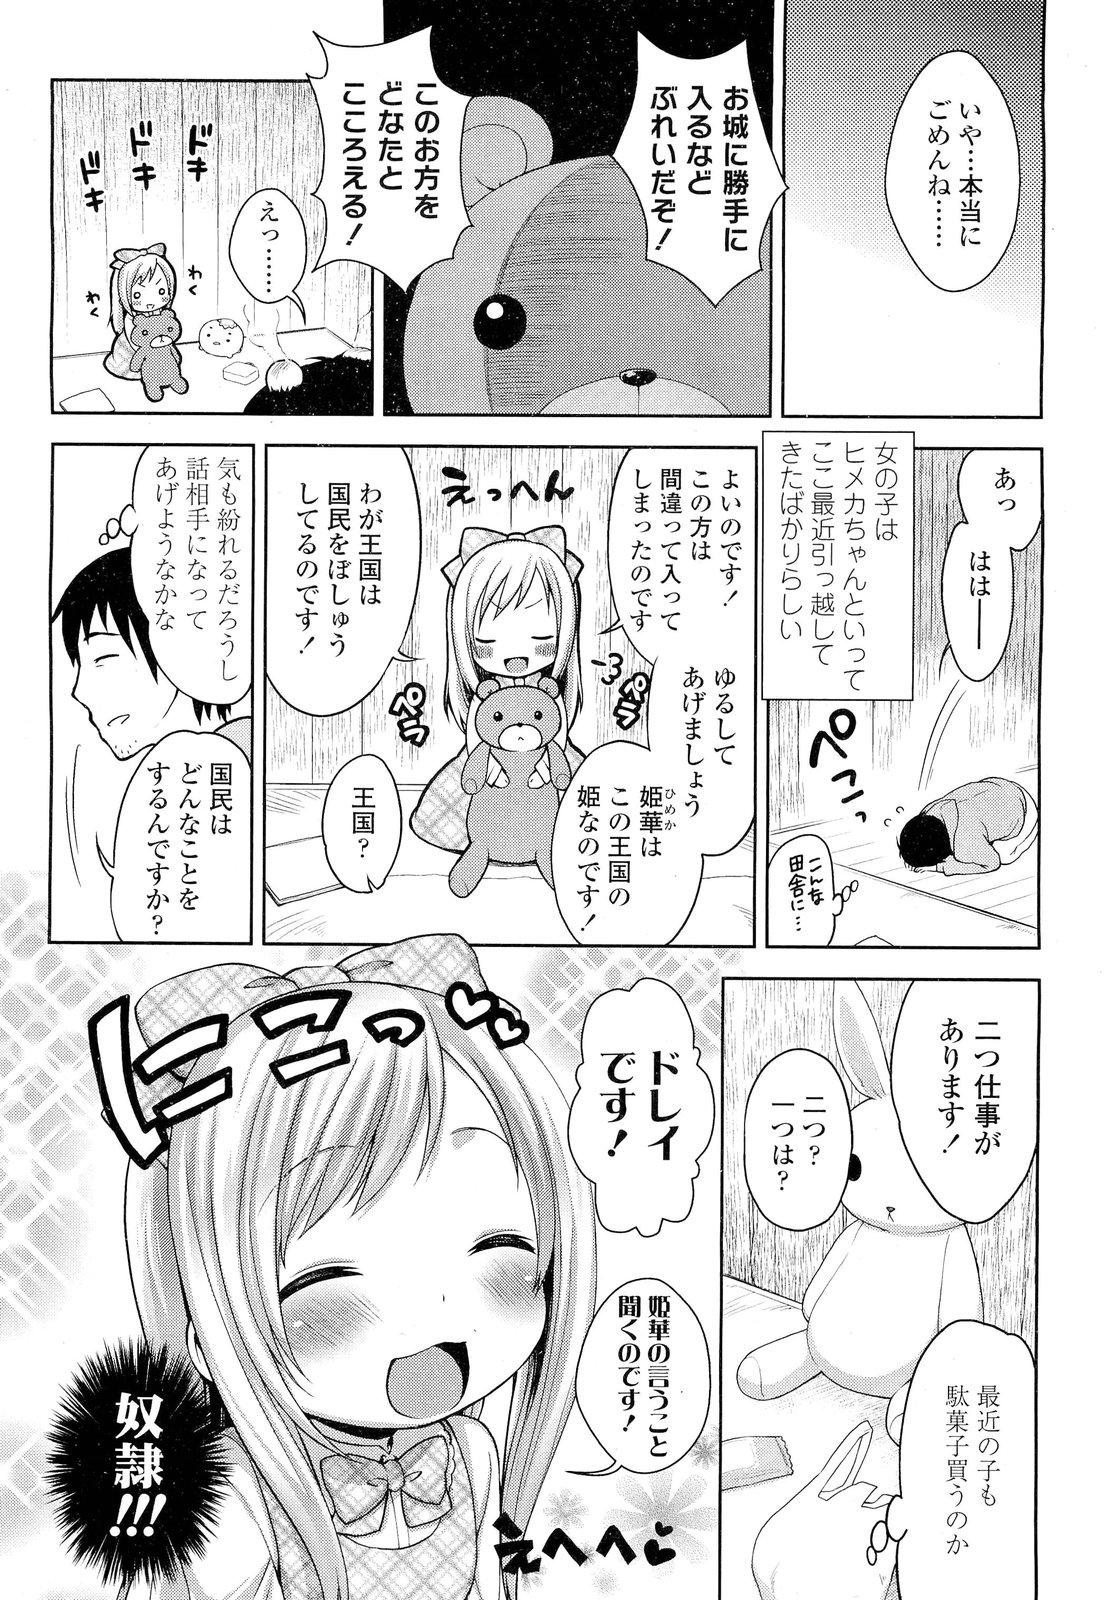 COMIC LO 2012-05 Vol. 98 53